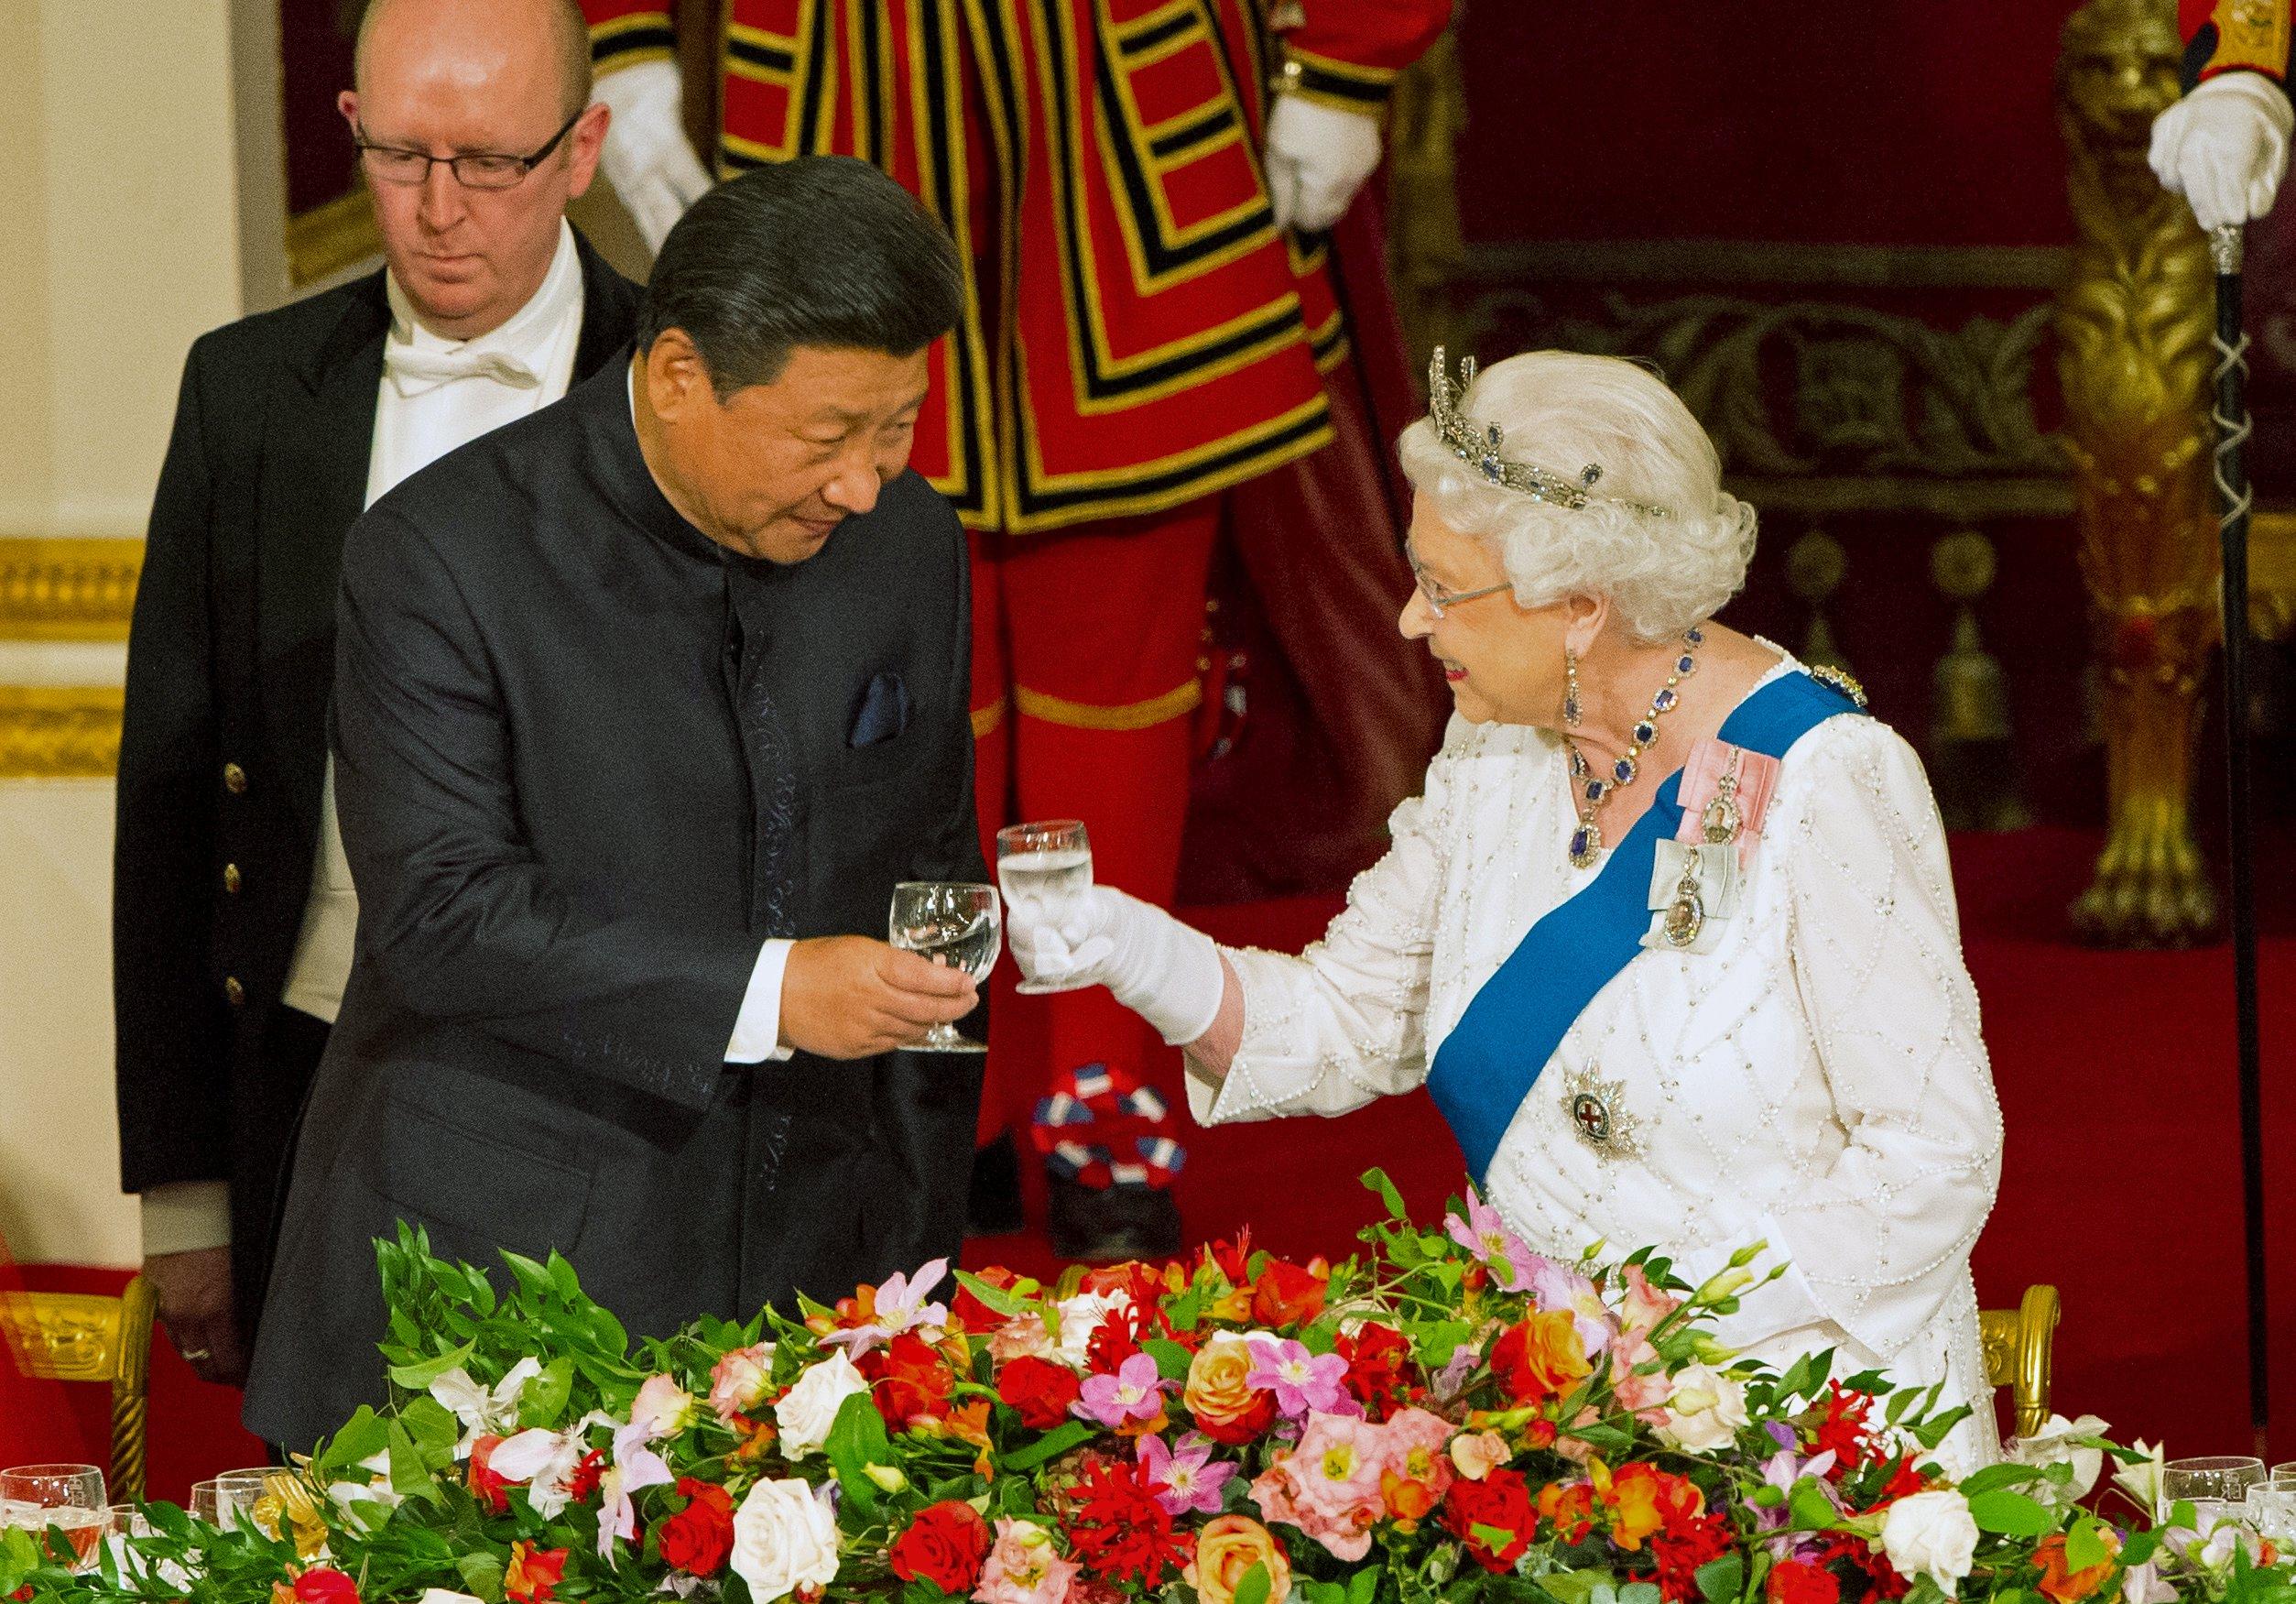 Presiden Tiongkok Xi Jinping dengan Ratu Elizabeth di acara makan malam kenegaraan di Istana Buckingham, London, pada hari pertama kunjungan kenegaraan Presiden Tiongkok ke Inggris, Selasa (20/10). ANTARA FOTO/REUTERS/Dominic Lipinski.